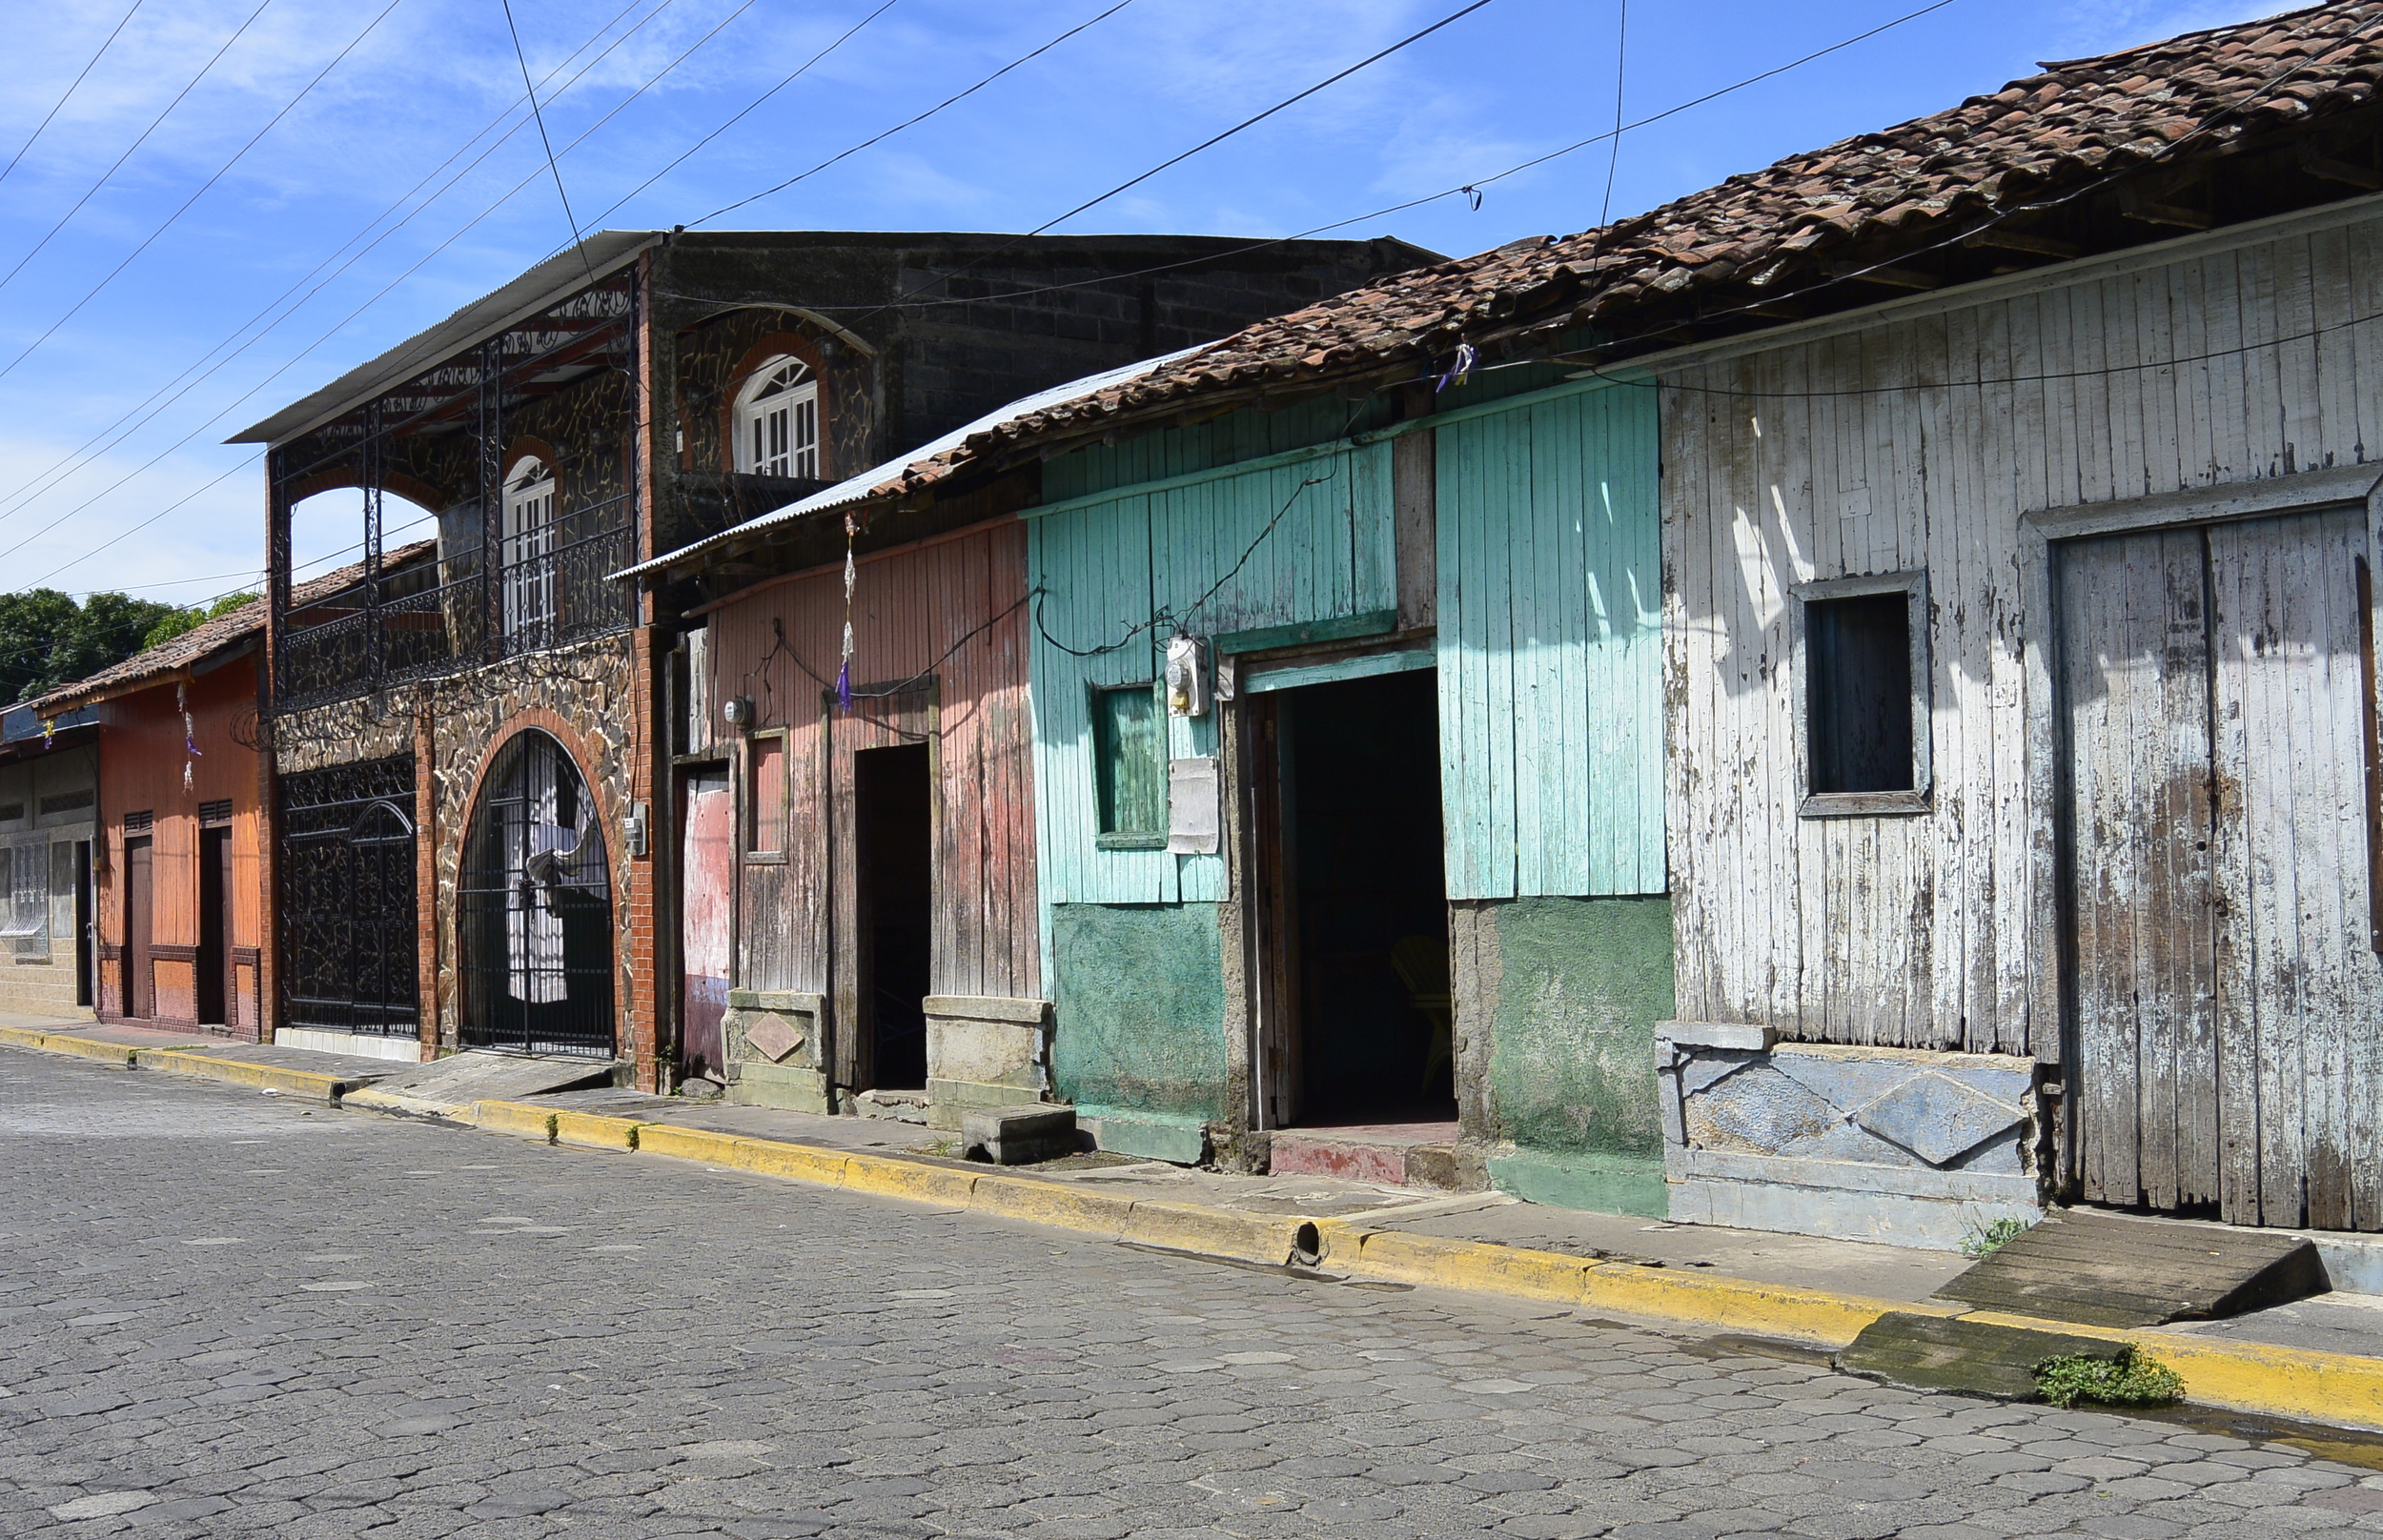 Houses in Corinto Nicaragua